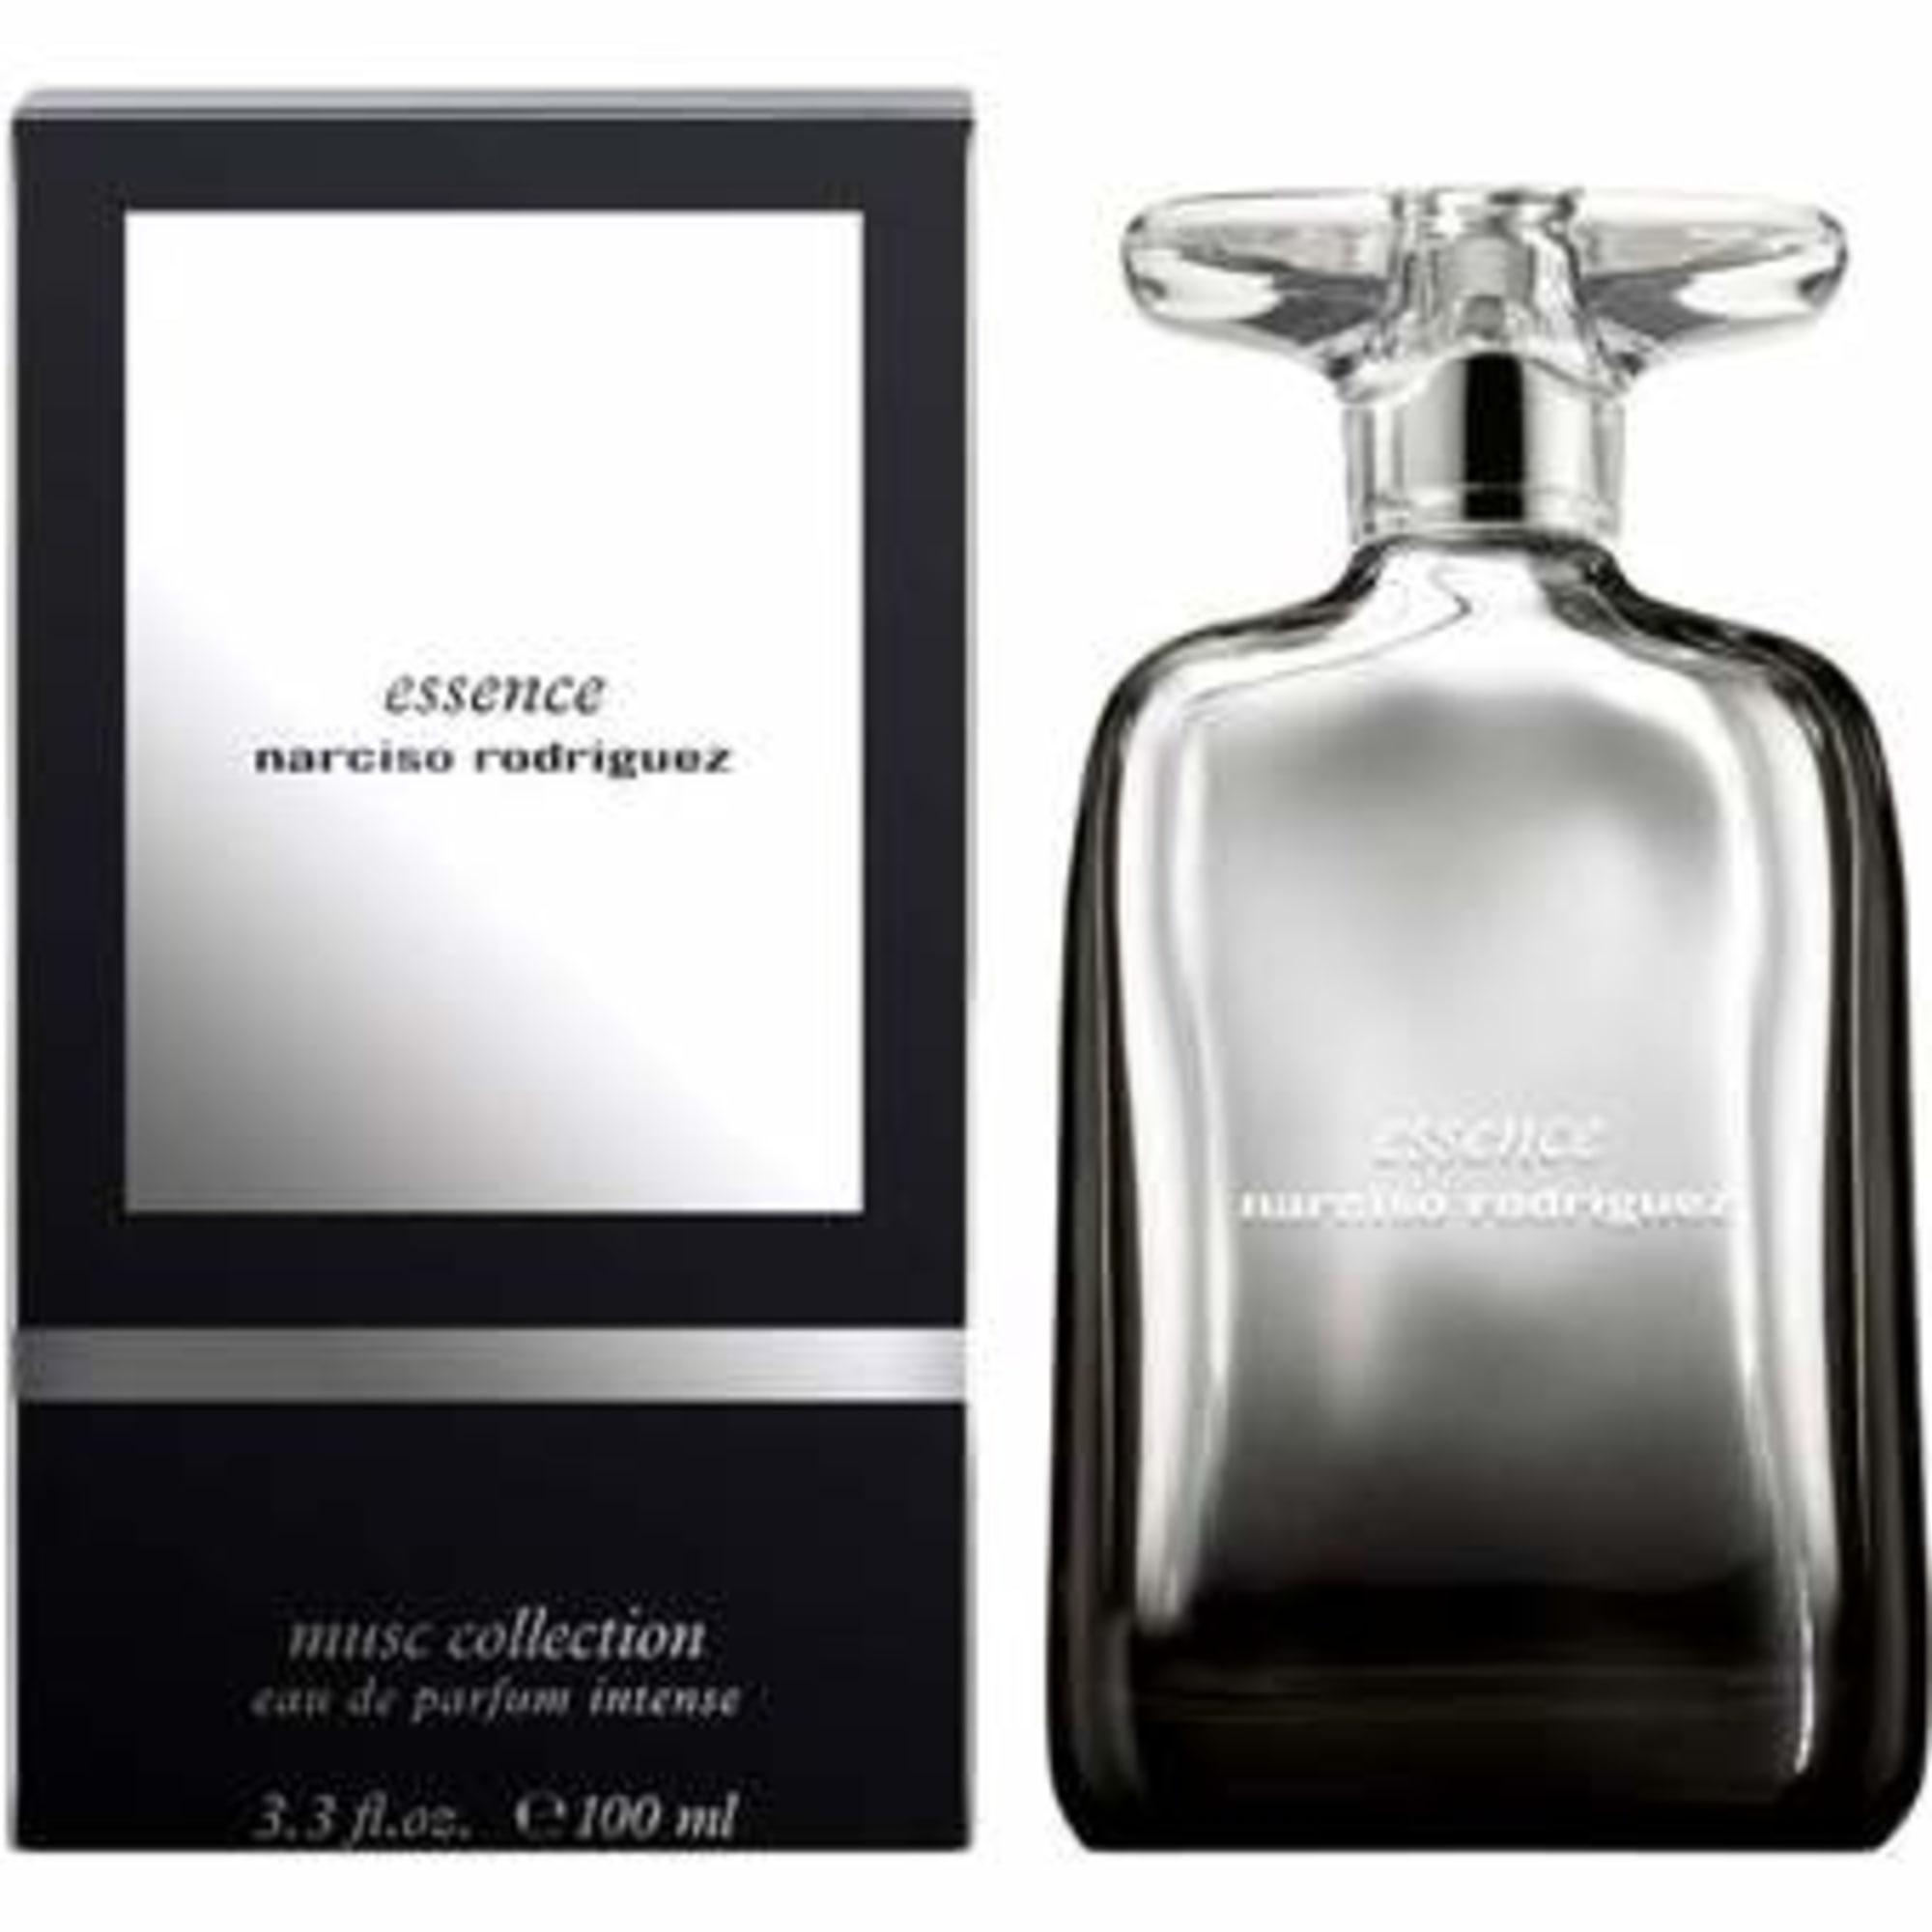 Extrait ParfumEssence De Extrait ParfumEssence De De De ParfumEssence Extrait Extrait ParfumEssence ParfumEssence De Extrait kXuOTiwPZ